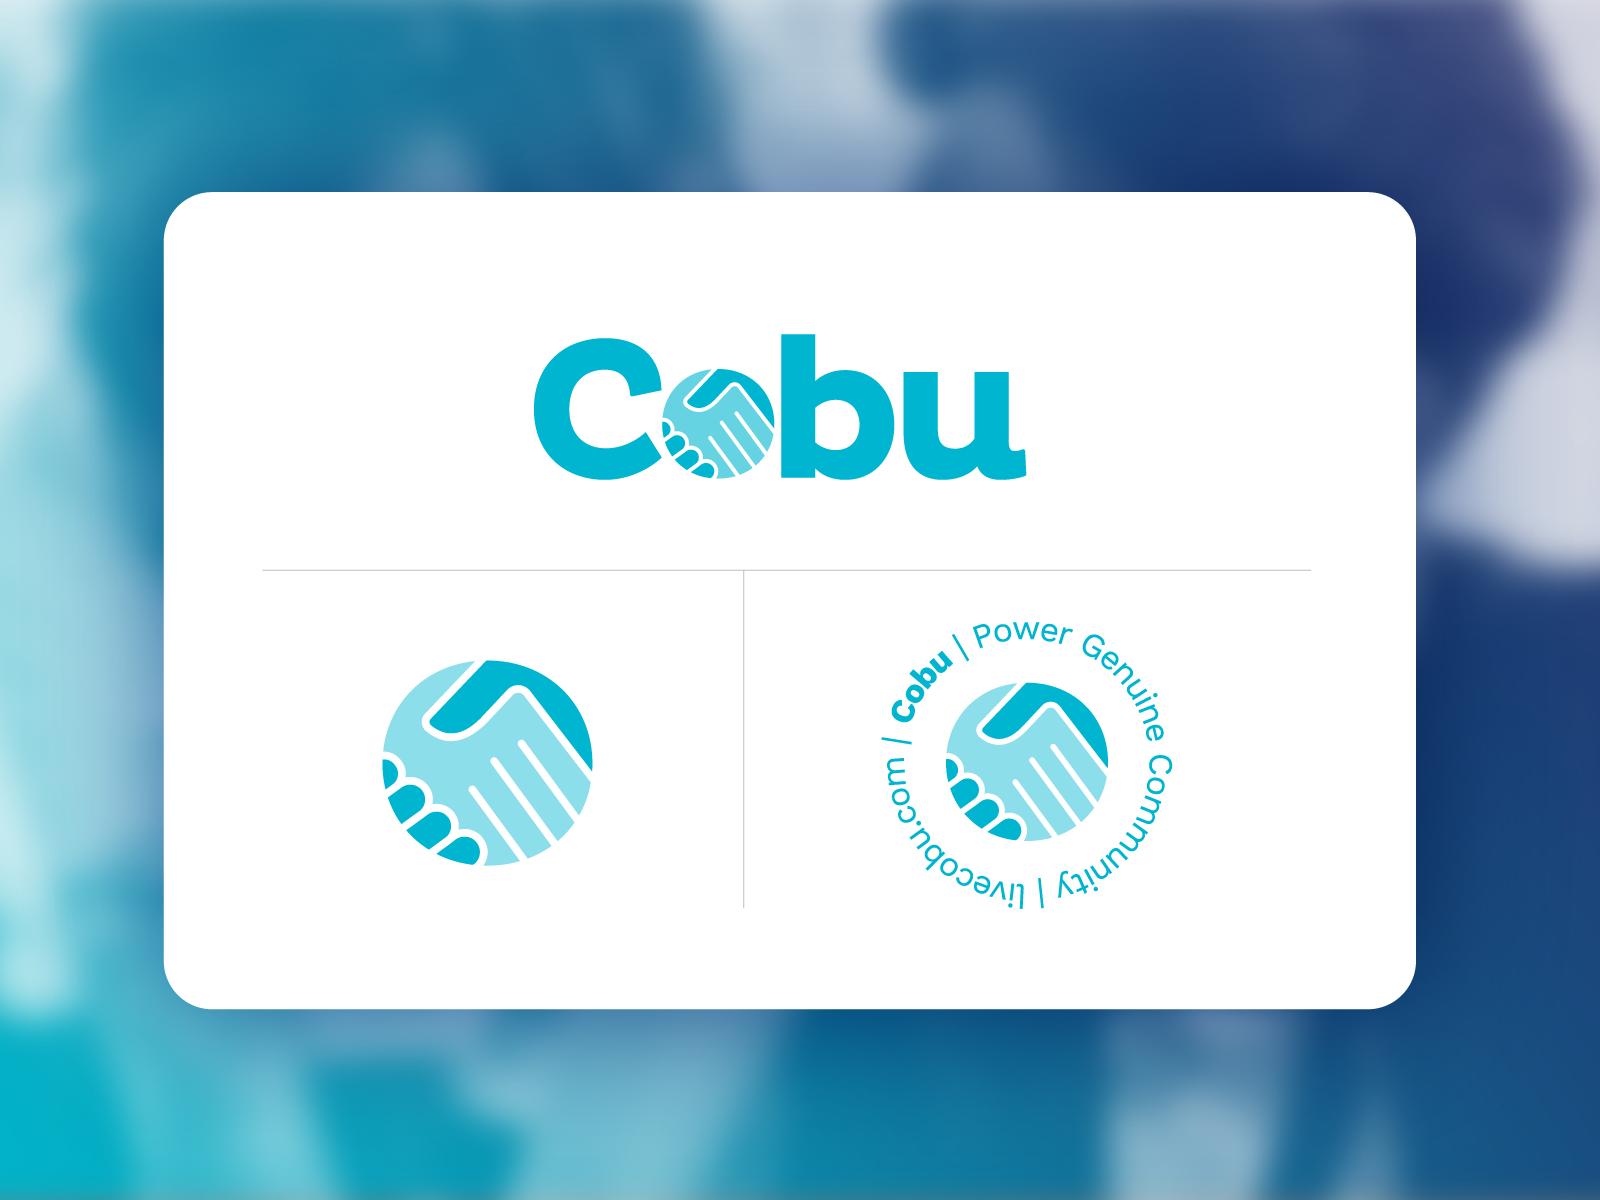 Cobu dribbble 1600x1200 0119